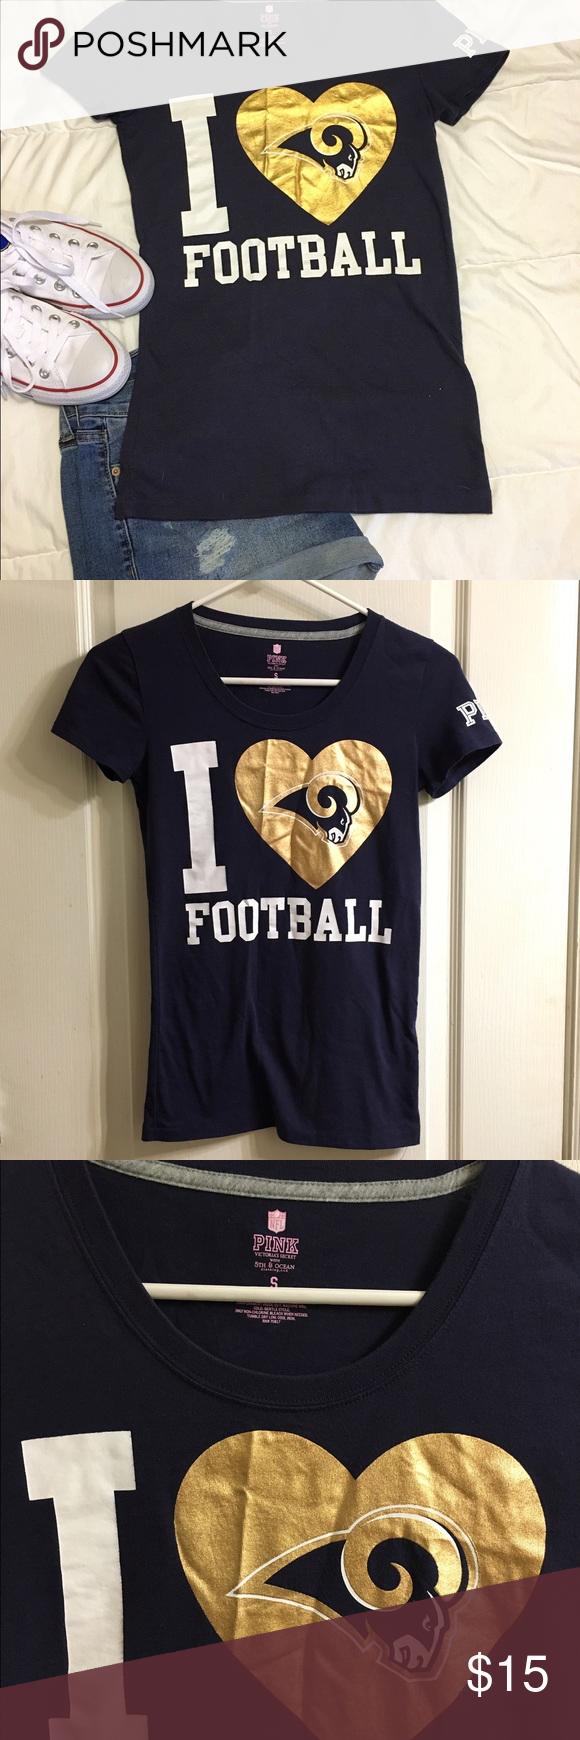 1f837c5c2 PINK LA Rams Shirt Alright